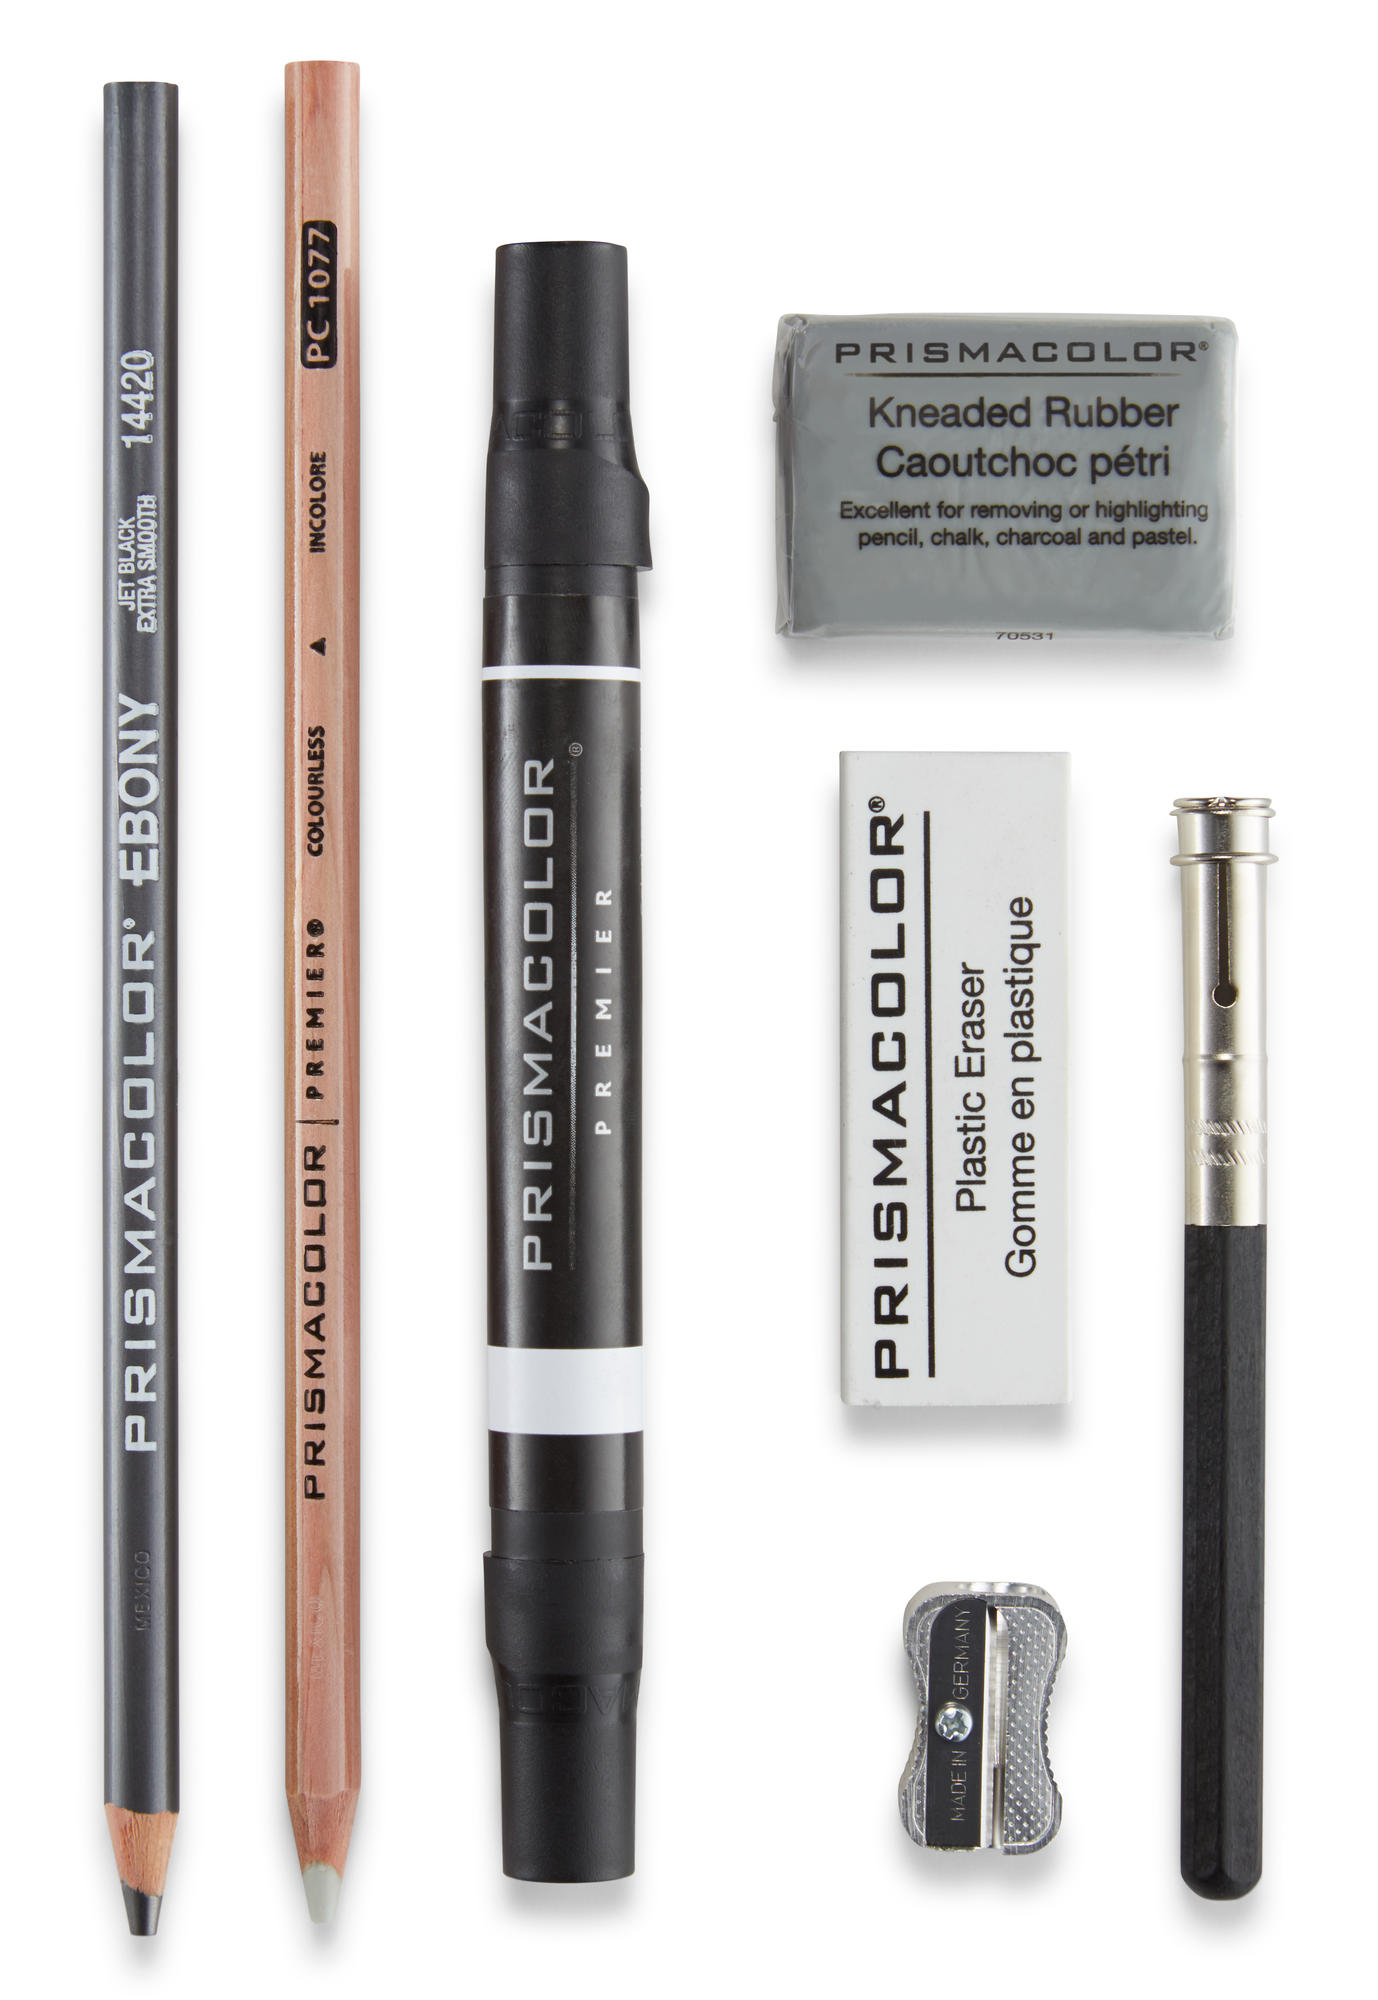 Prismacolor Colored Pencil Accessory Set